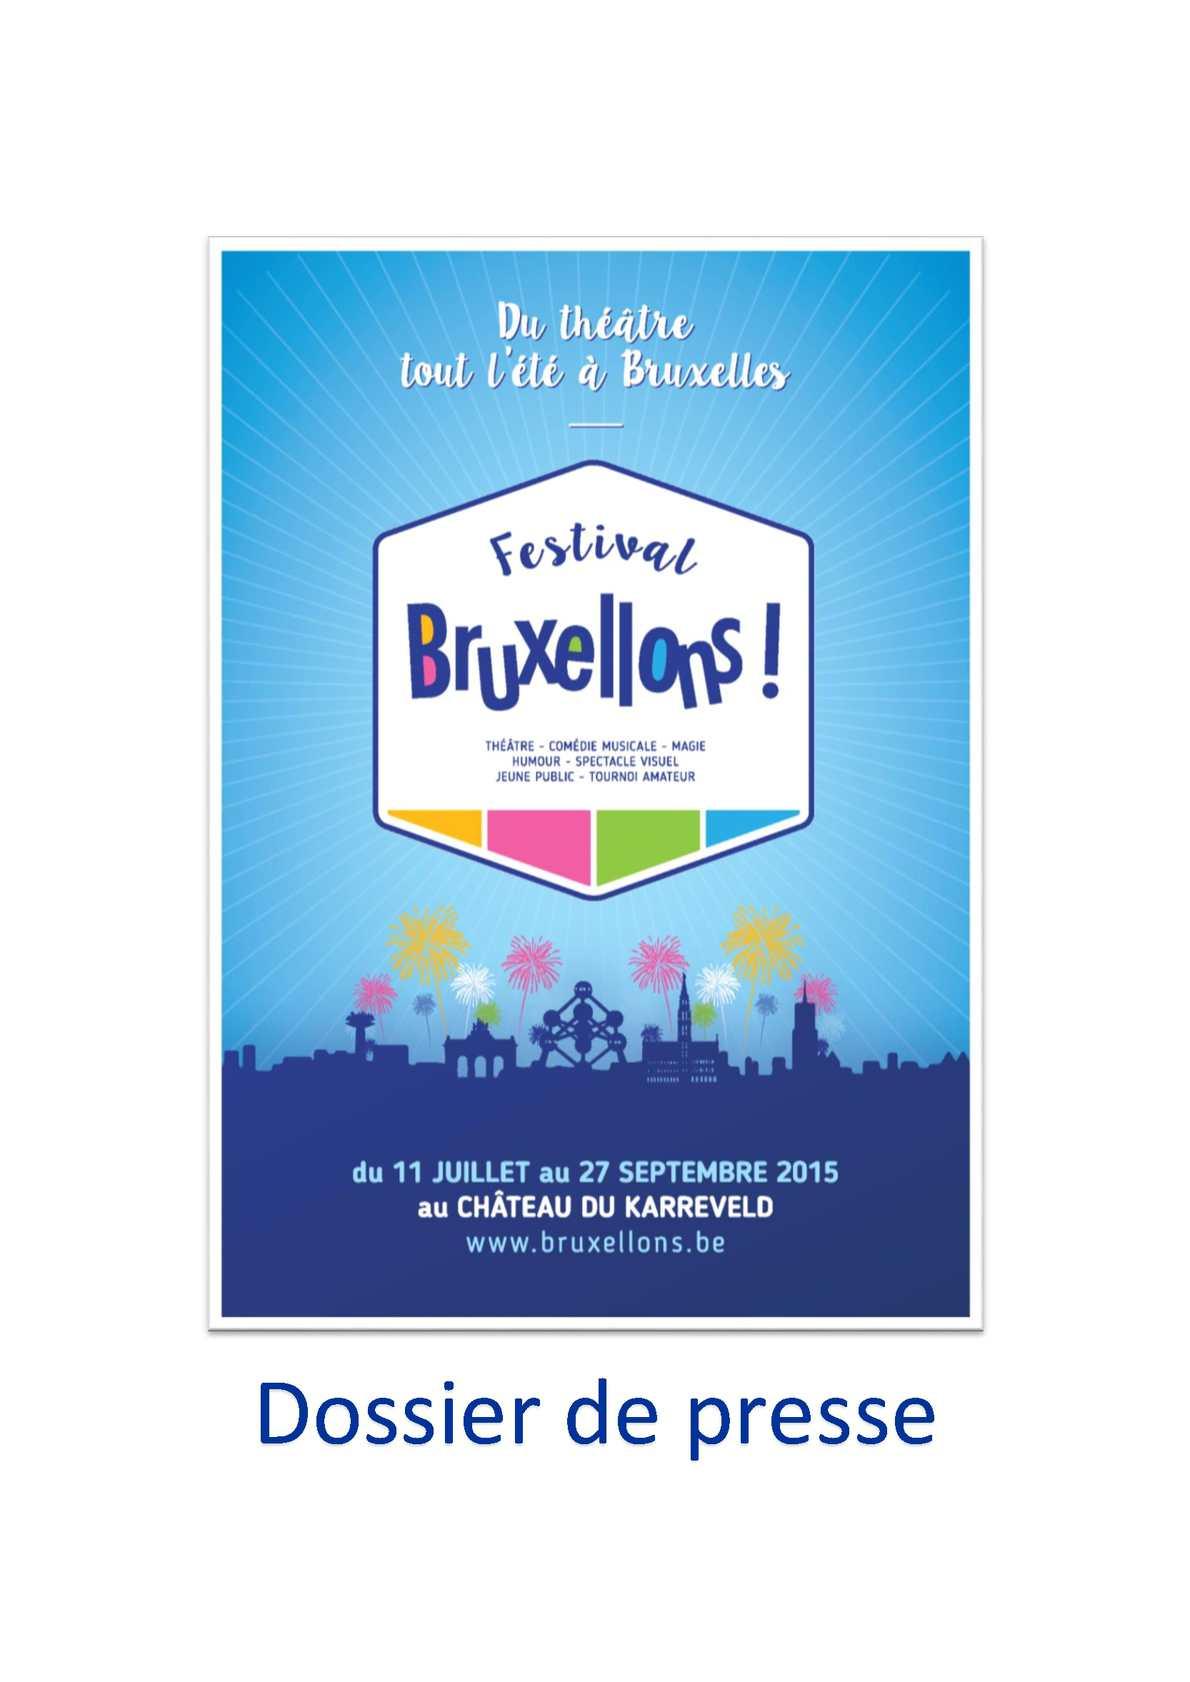 08878d47ec4e50 Calaméo - Dossier De Presse Bruxellons 2015